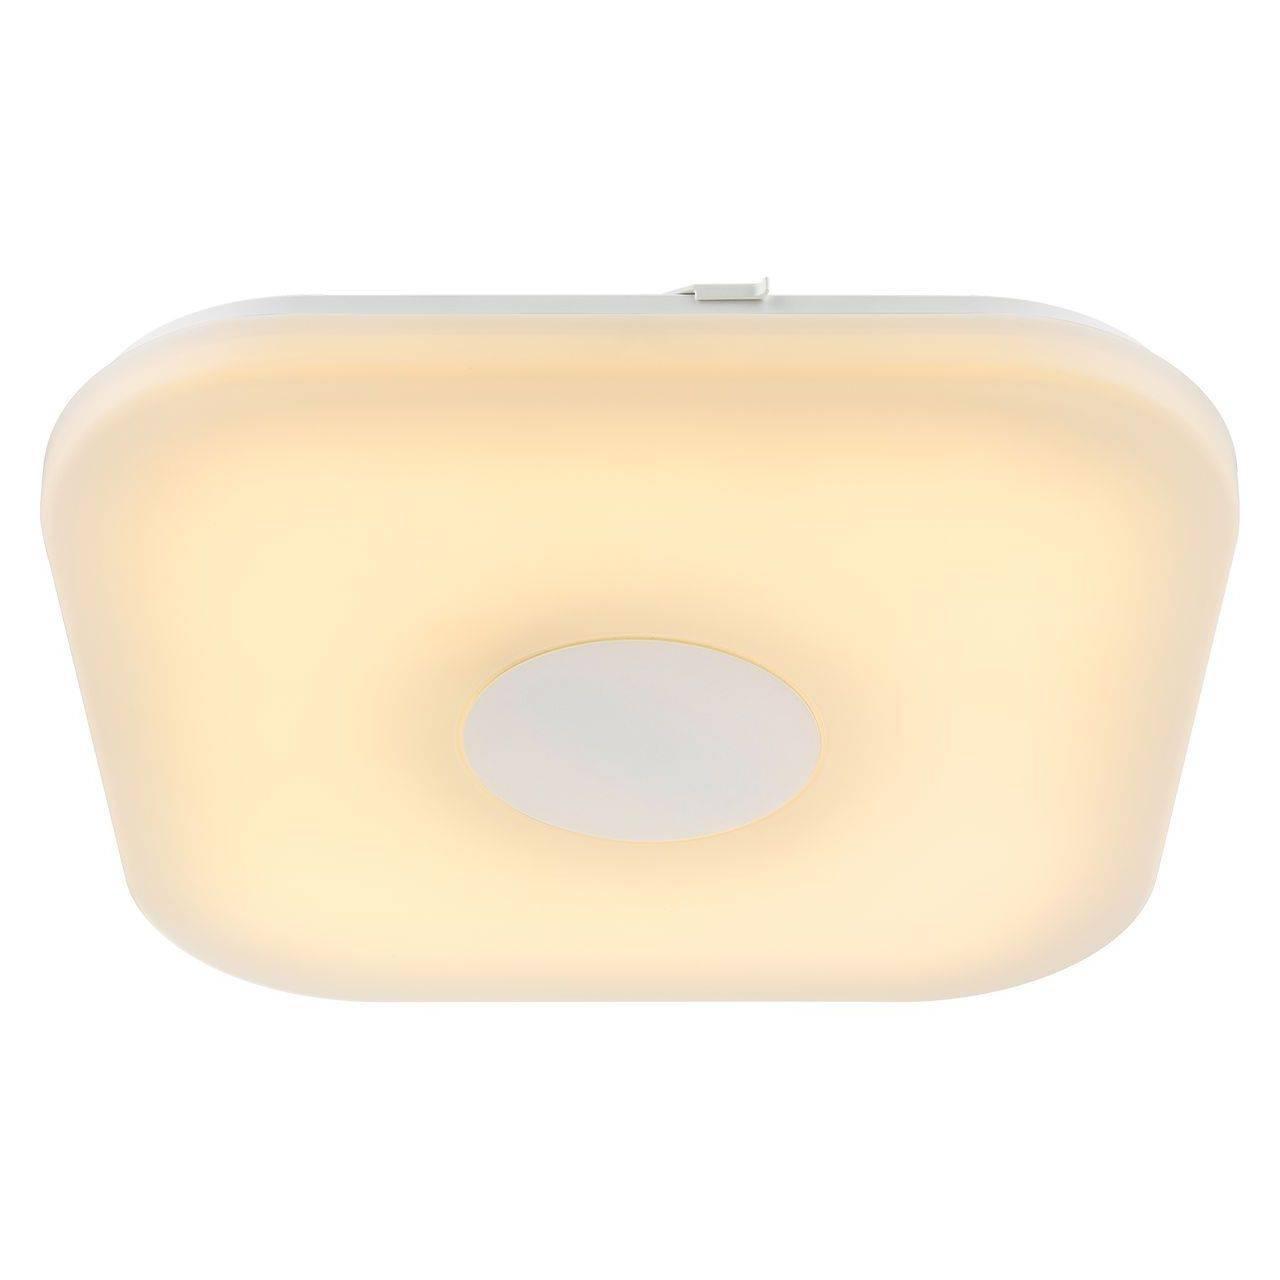 Потолочный светодиодный светильник Globo Felion 41328 потолочный светодиодный светильник globo aisha 49357 17